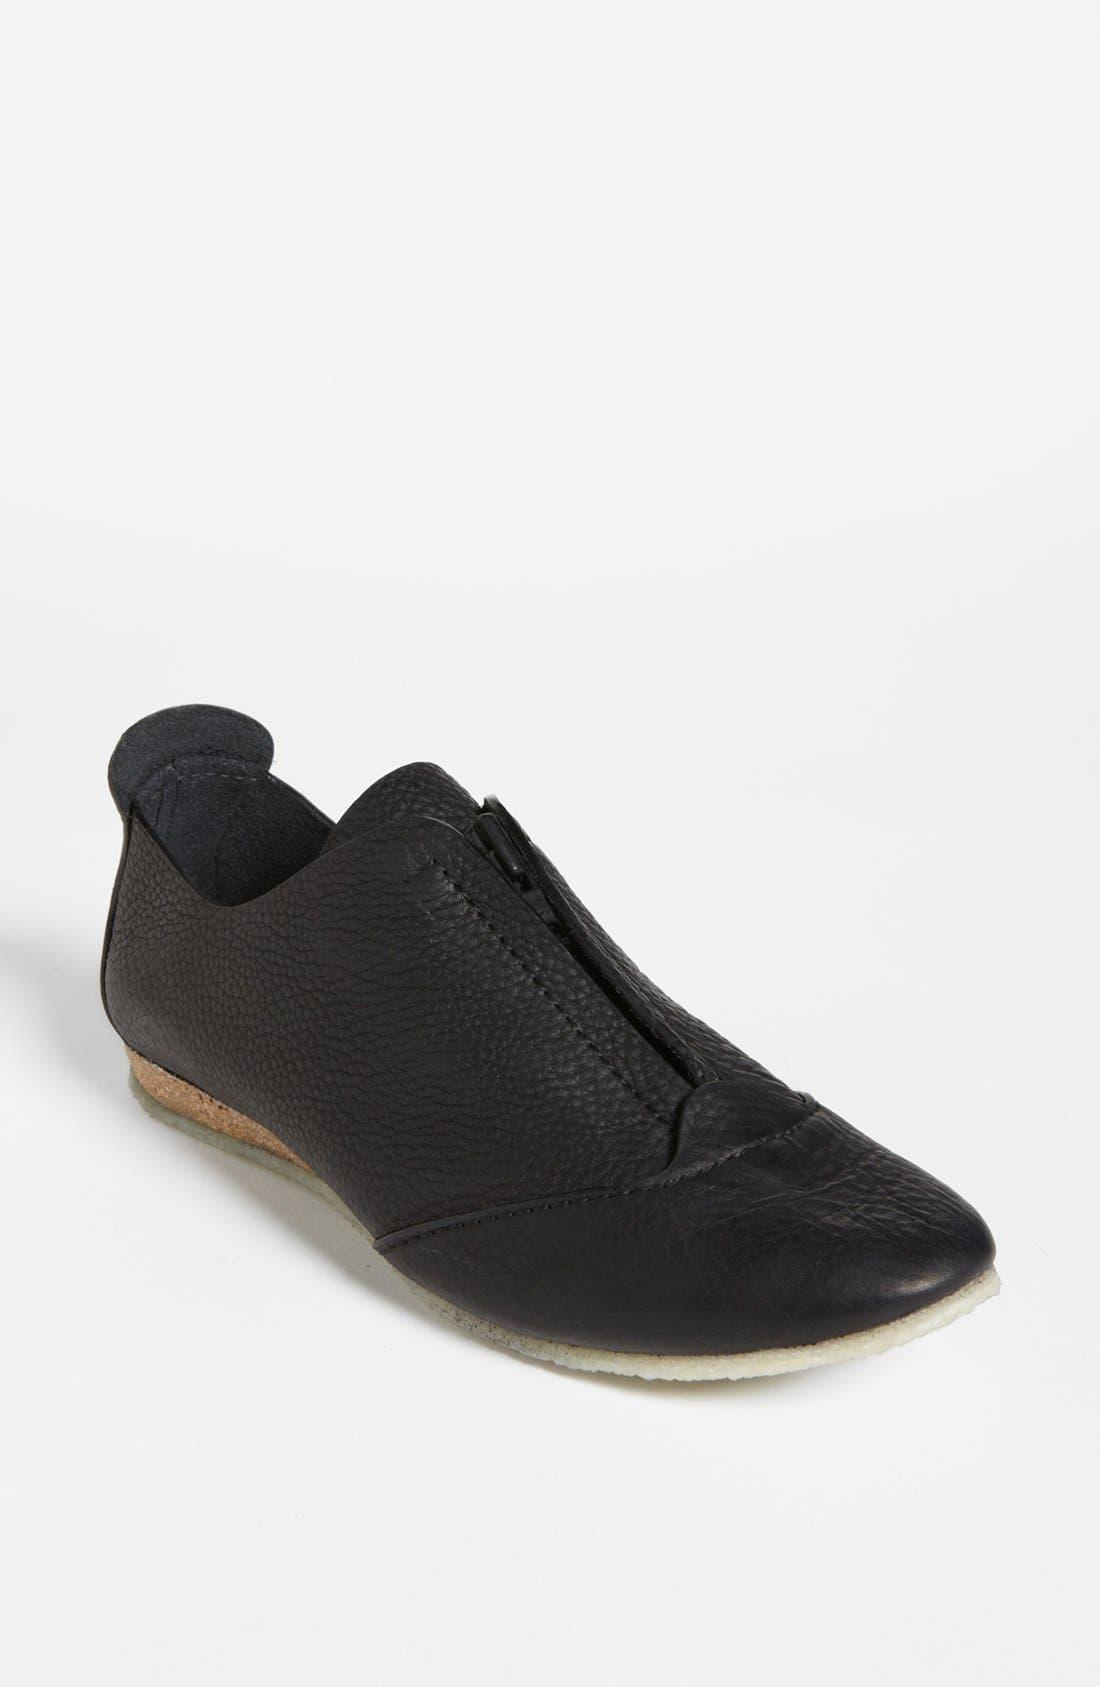 Alternate Image 1 Selected - Pedro Garcia 'River' Zip Front Loafer